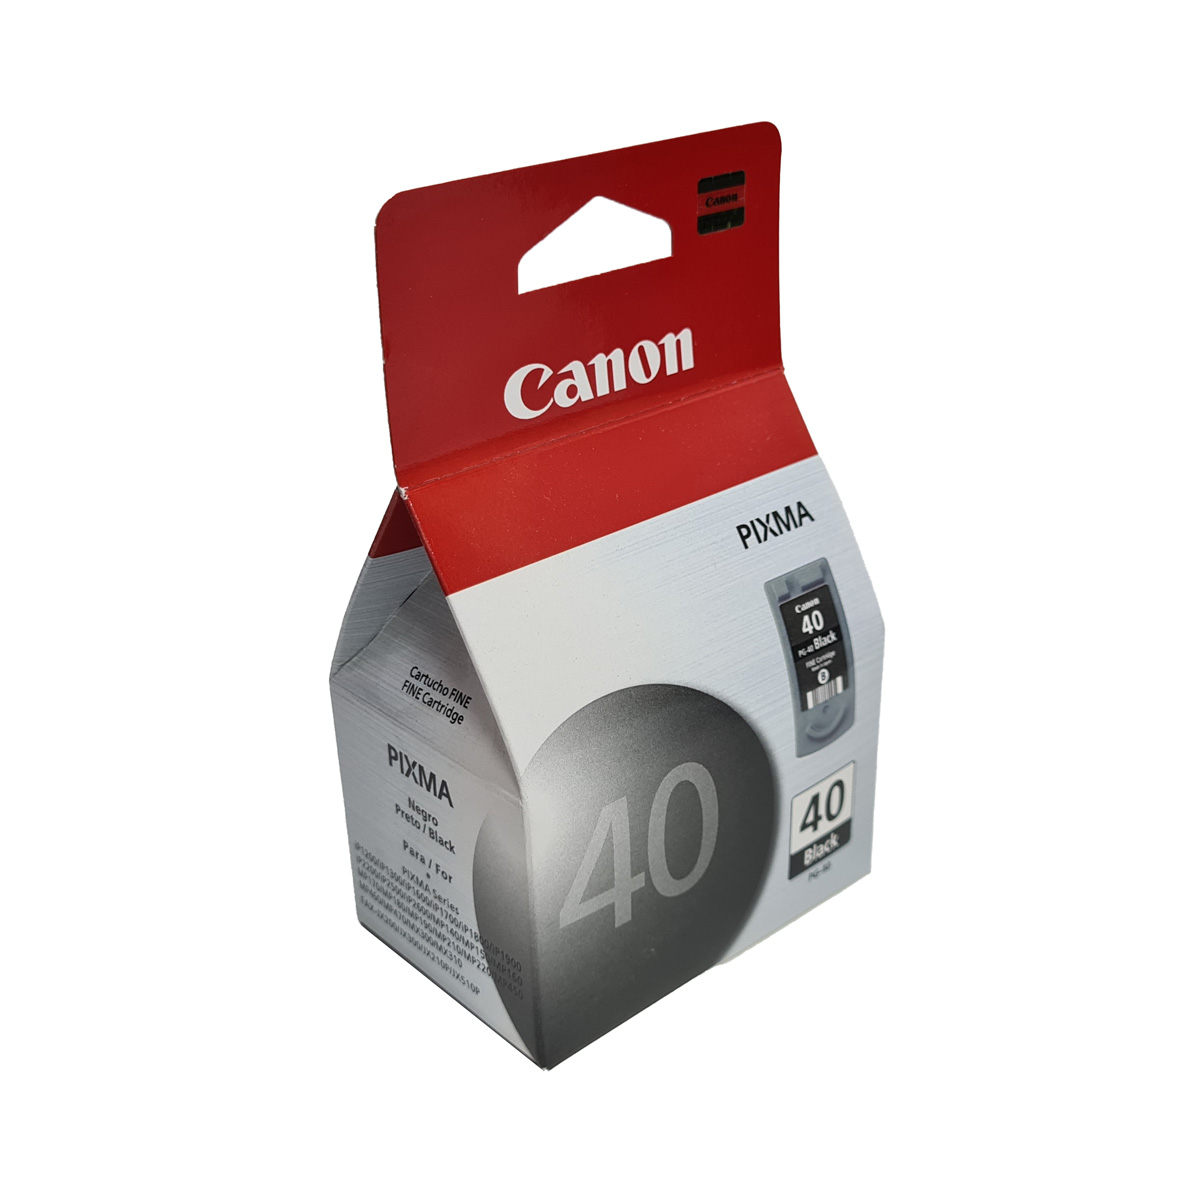 Cartucho Canon PG40 Preto para Pixma IP1200 IP1300 MP140 MP160